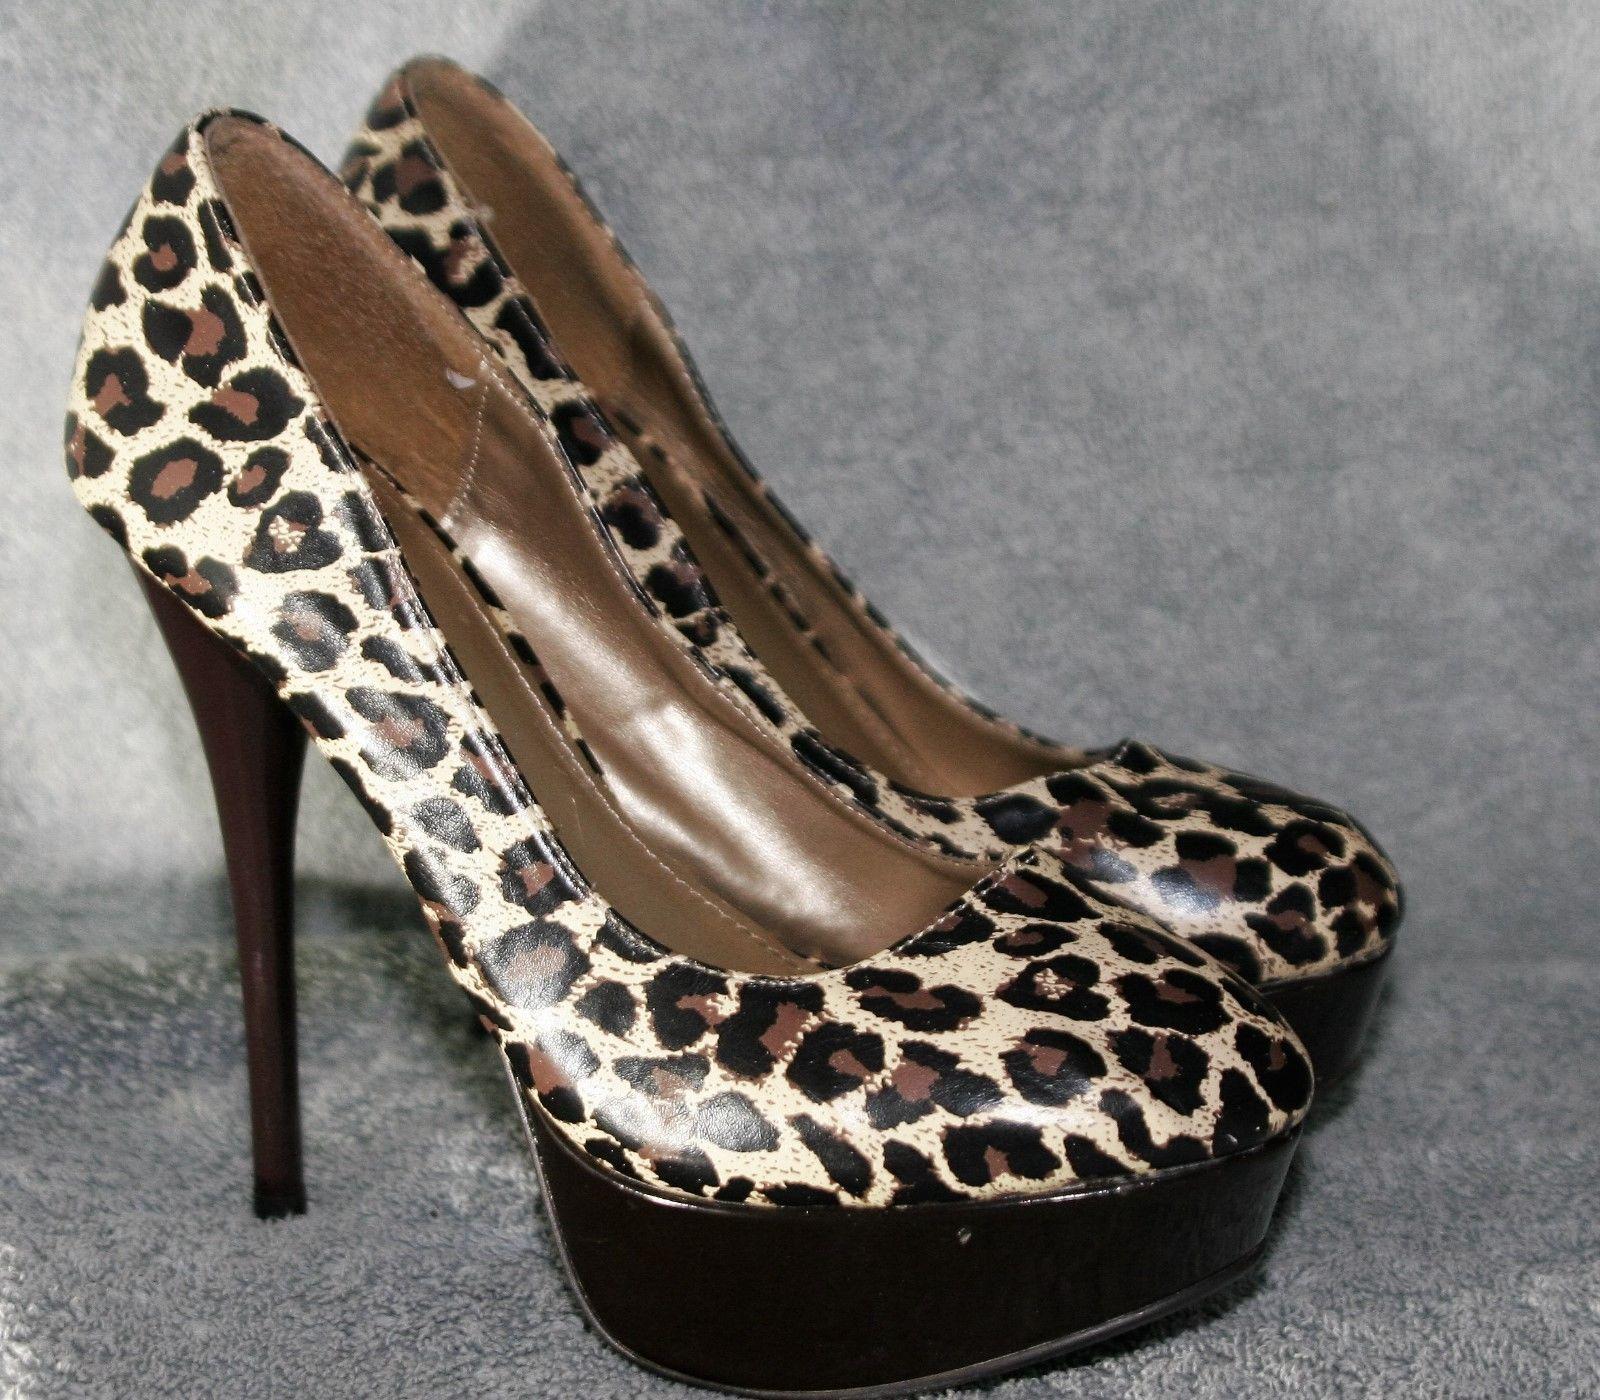 f36c3451096 Qupid Leopard Cheatah Print Platform Heels and 50 similar items. 1160 1